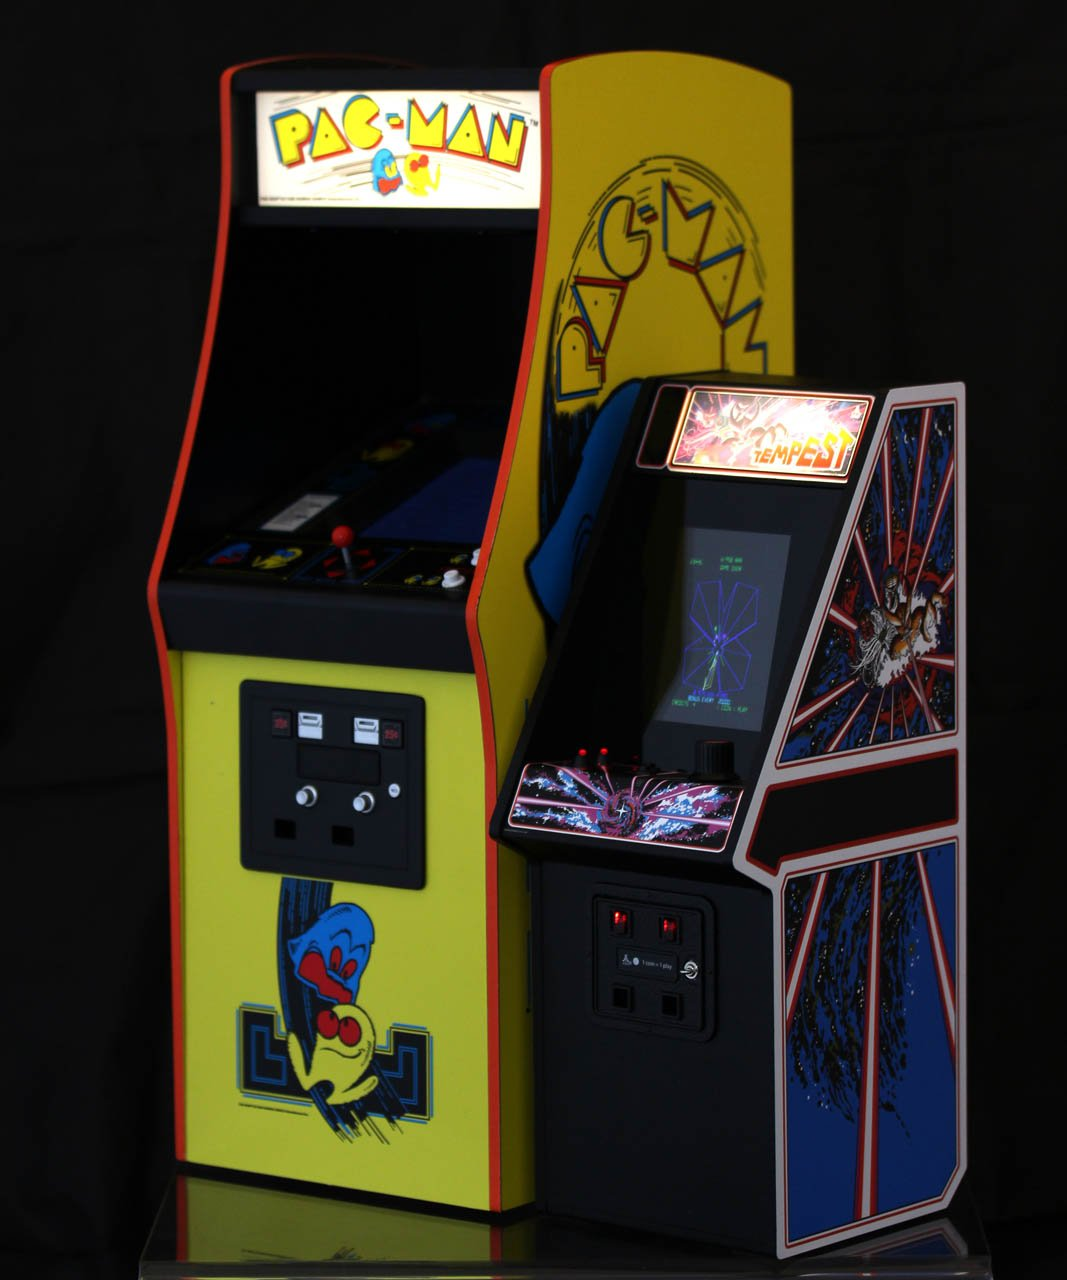 Modern mini-arcade cabs put a high-gloss twist on a classic